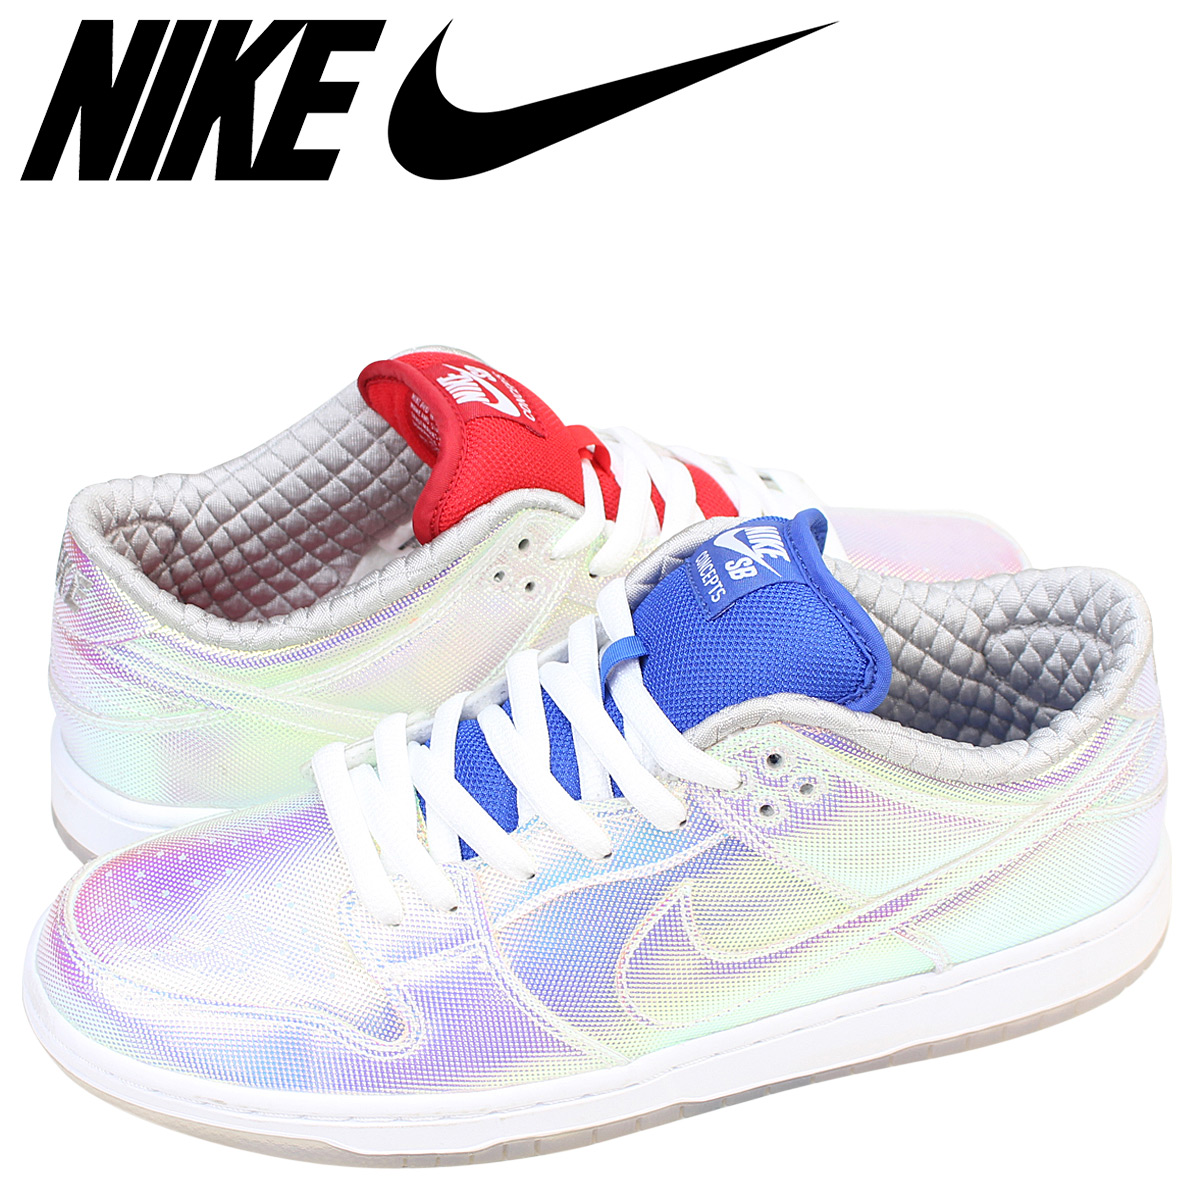 elegant några dagar bort onlinebutik holy grail sneakers